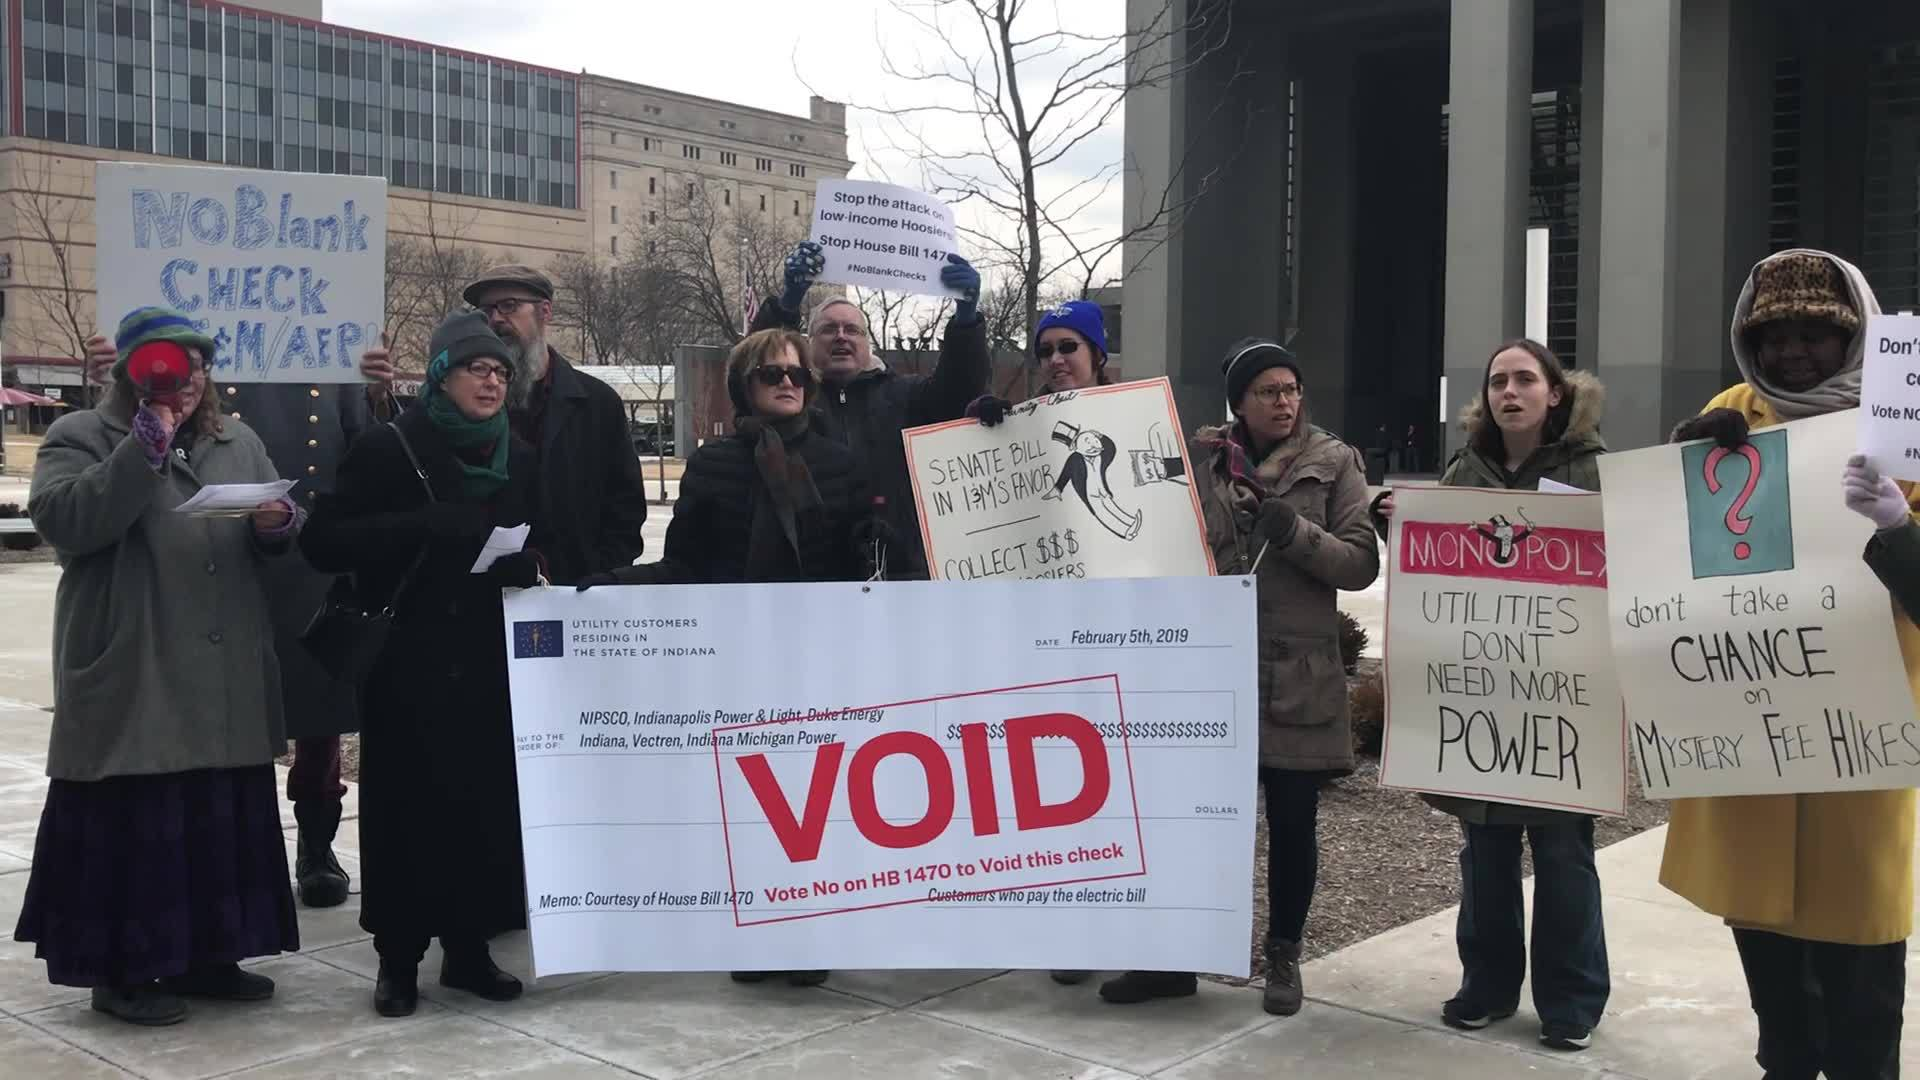 Bill on utility regulations sparks protest